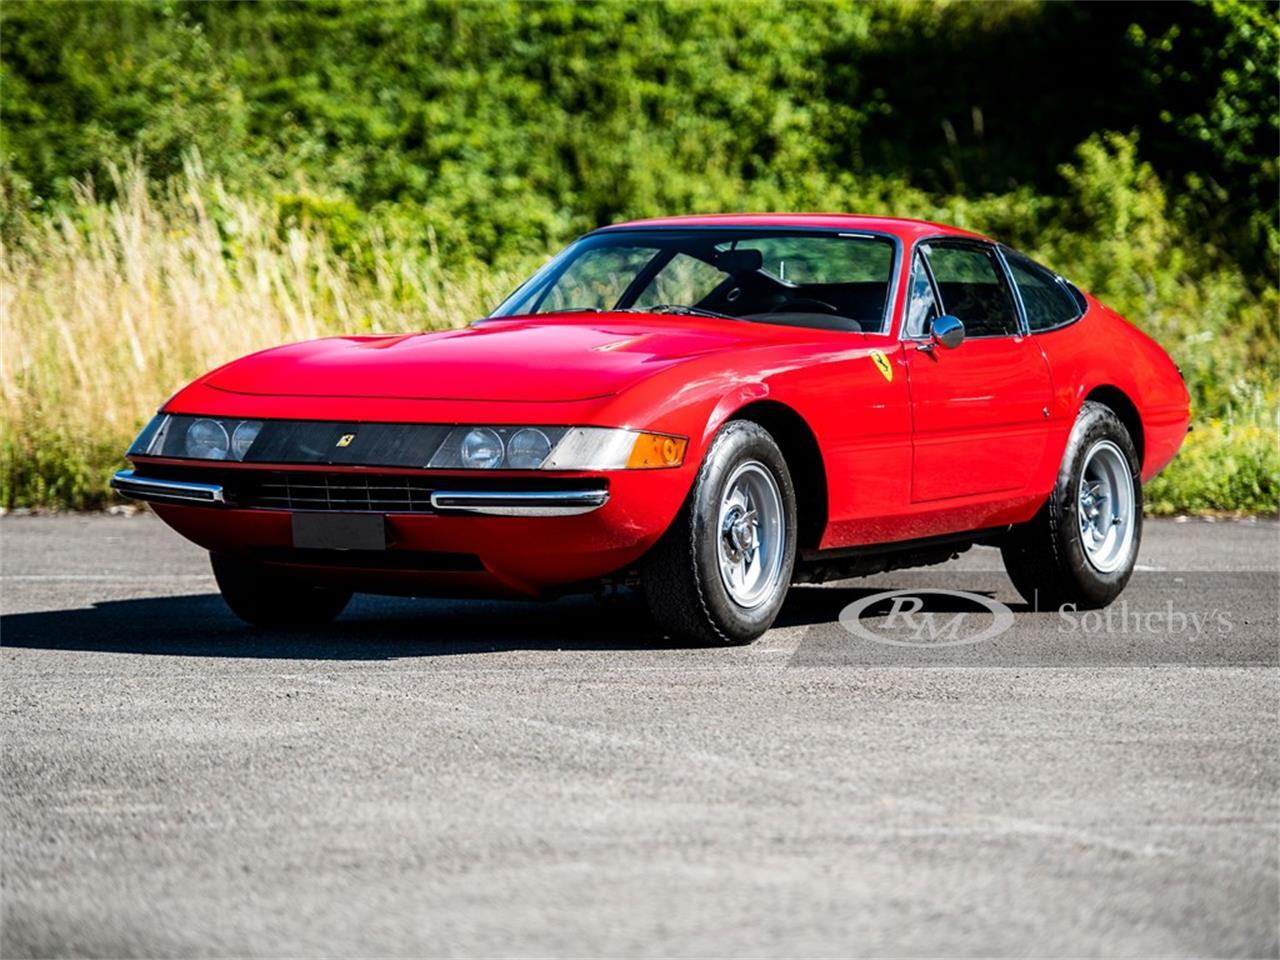 1970 Ferrari 365 GTB/4 Daytona (CC-1361977) for sale in London, United Kingdom